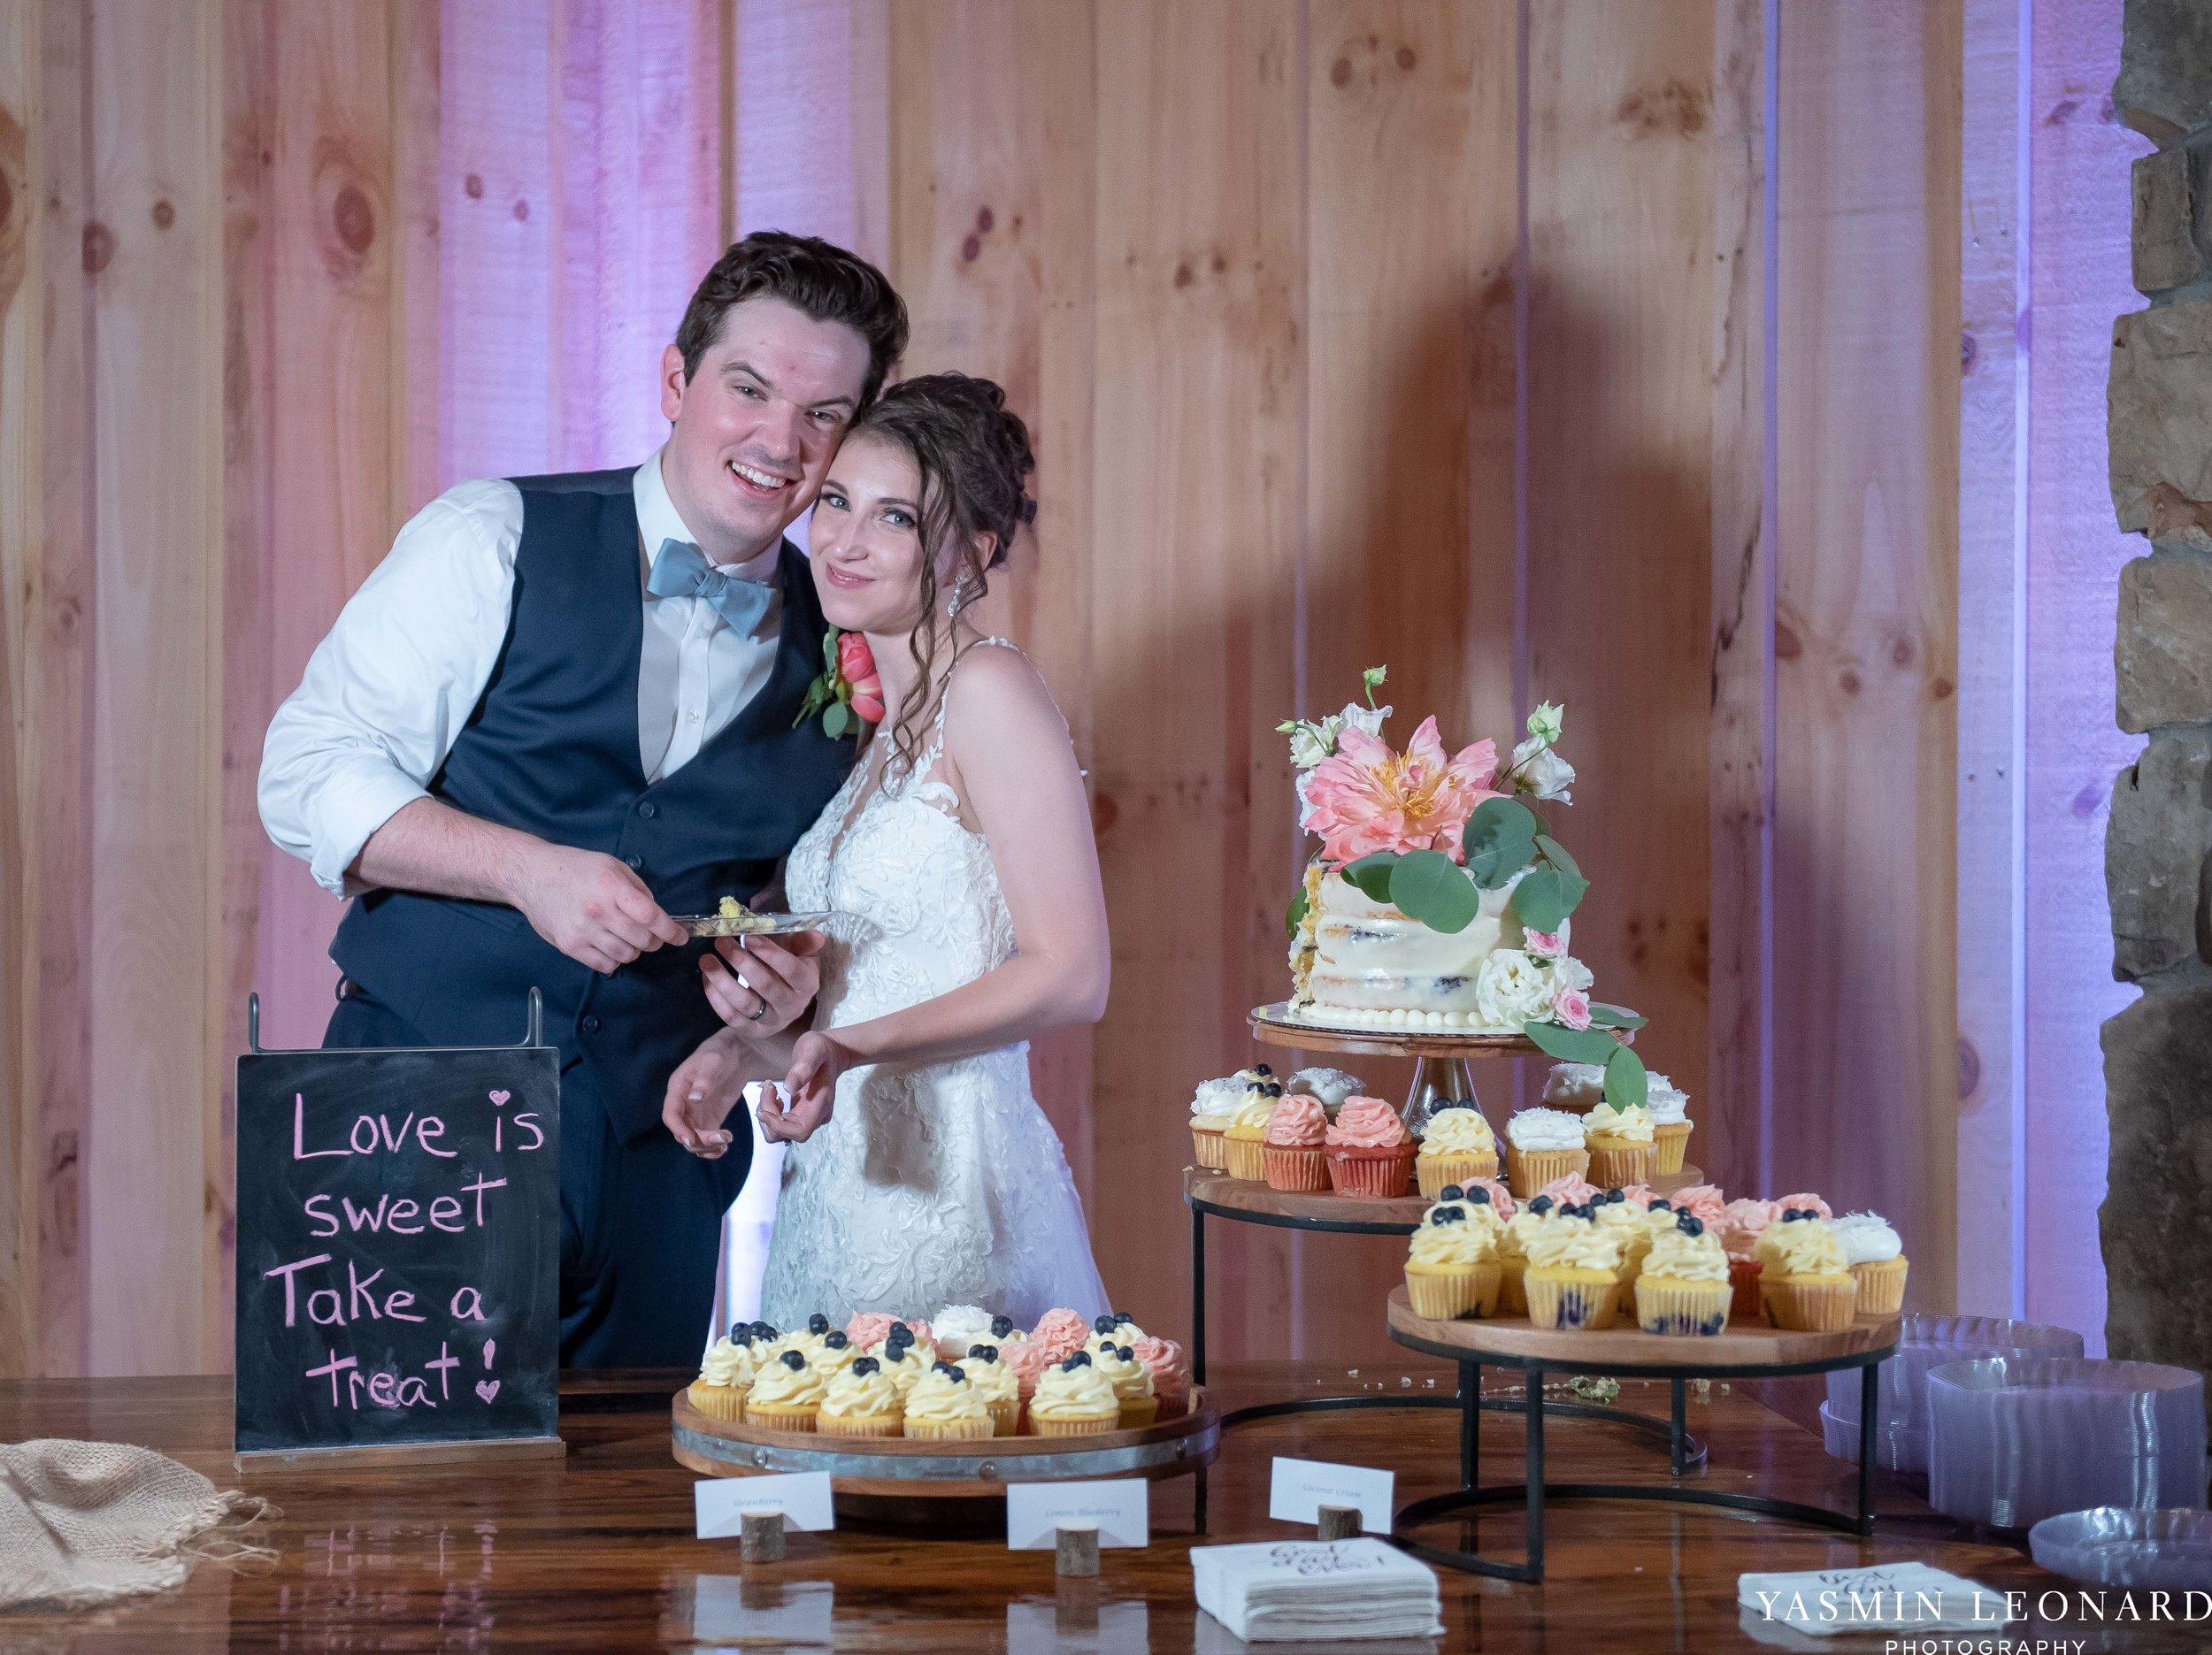 Old Homeplace Vineyard - NC Weddings - Outdoor Summer Weddings - Peony Boutique - Vineyard Wedding - NC Photographer - Yasmin Leonard Photography-66.jpg